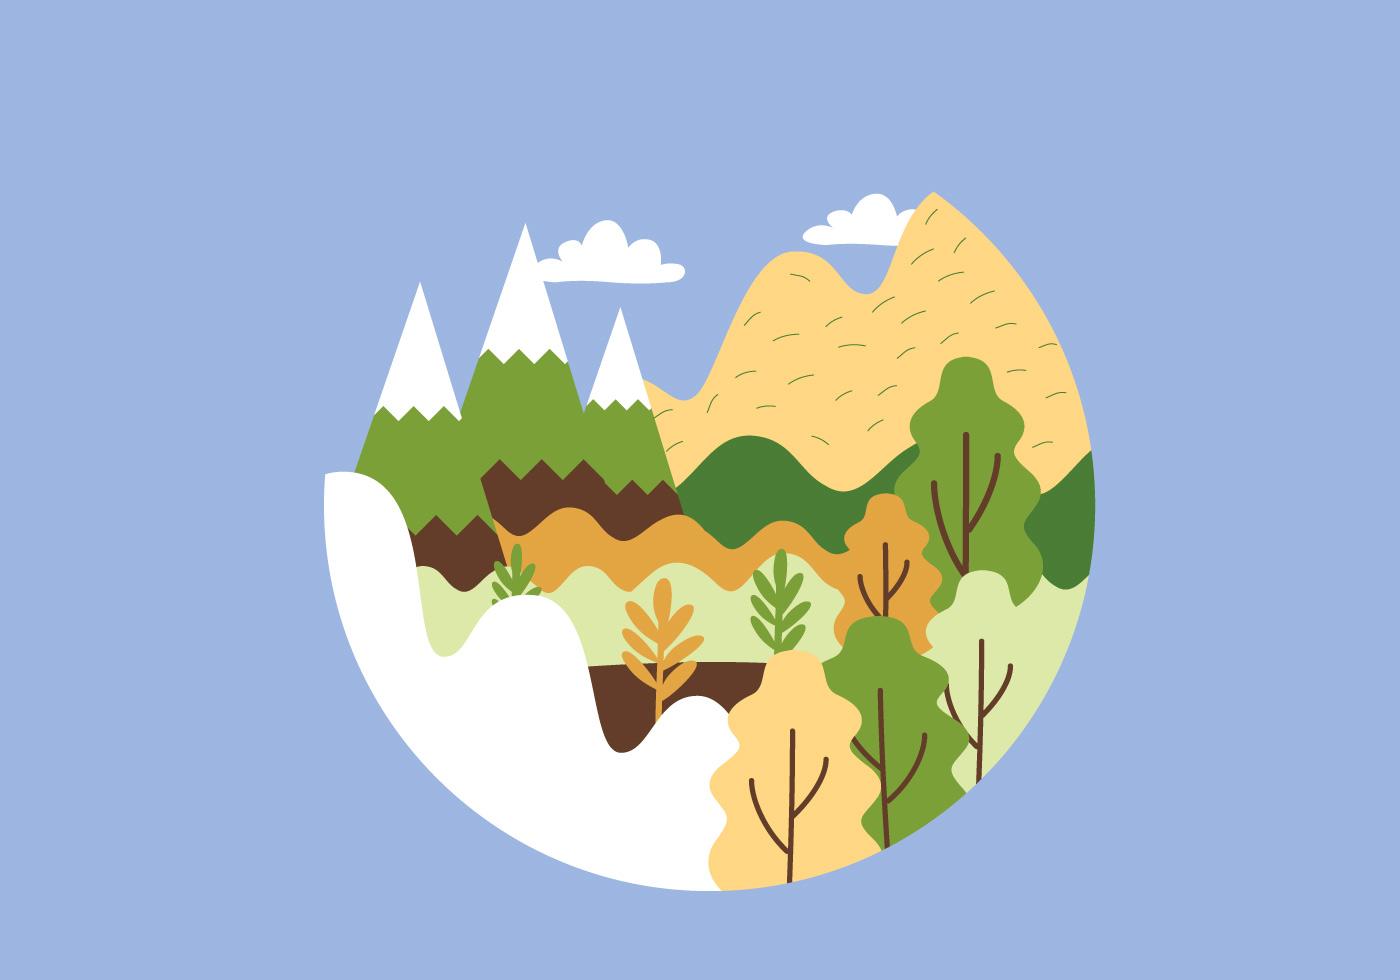 circular mountain landscape illustration